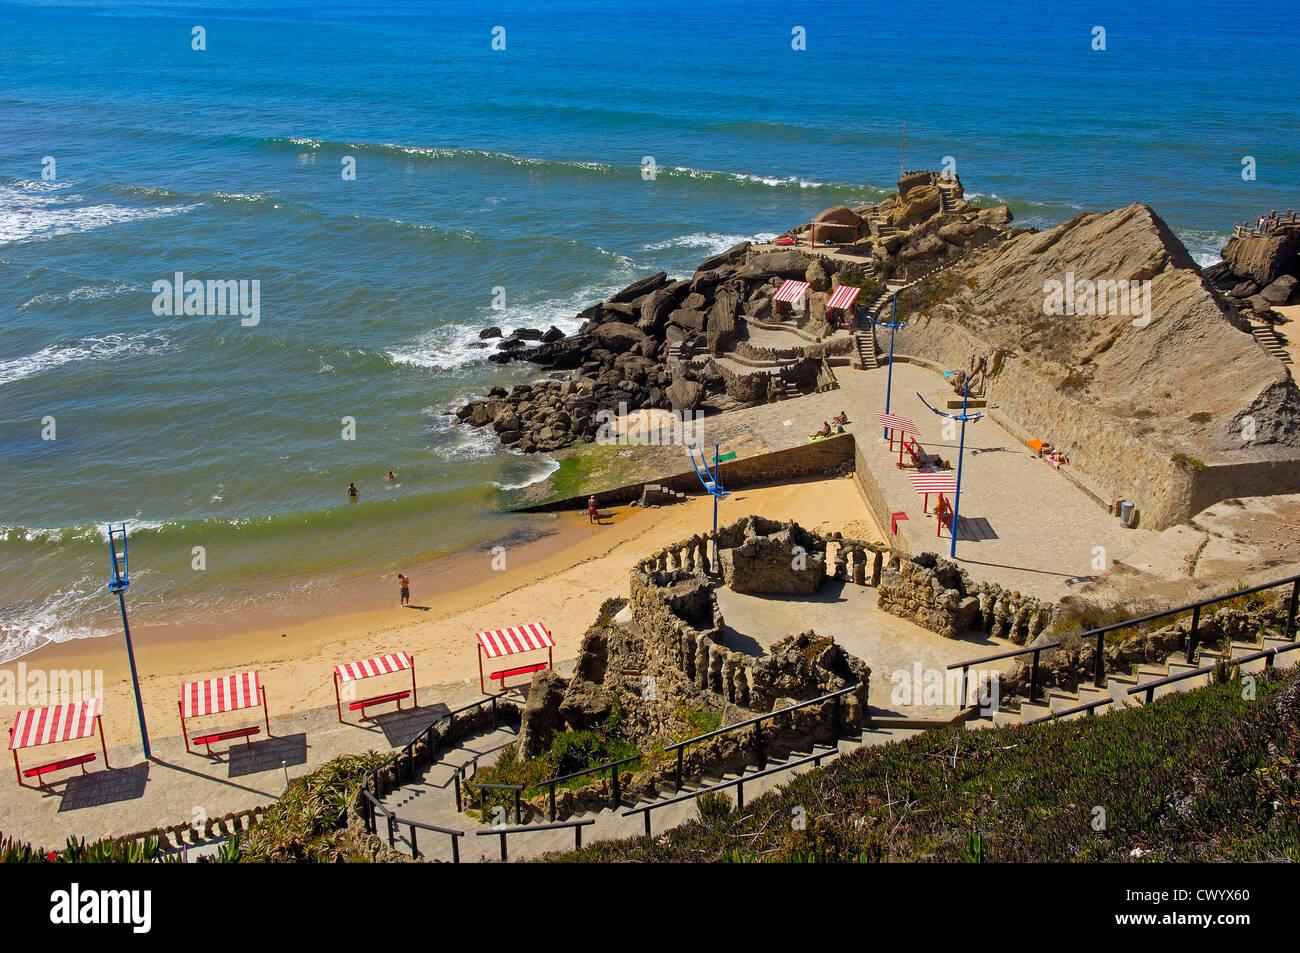 Santacruz, Praia formosa, Torres Vedras, Portugal, Europe - Stock Image